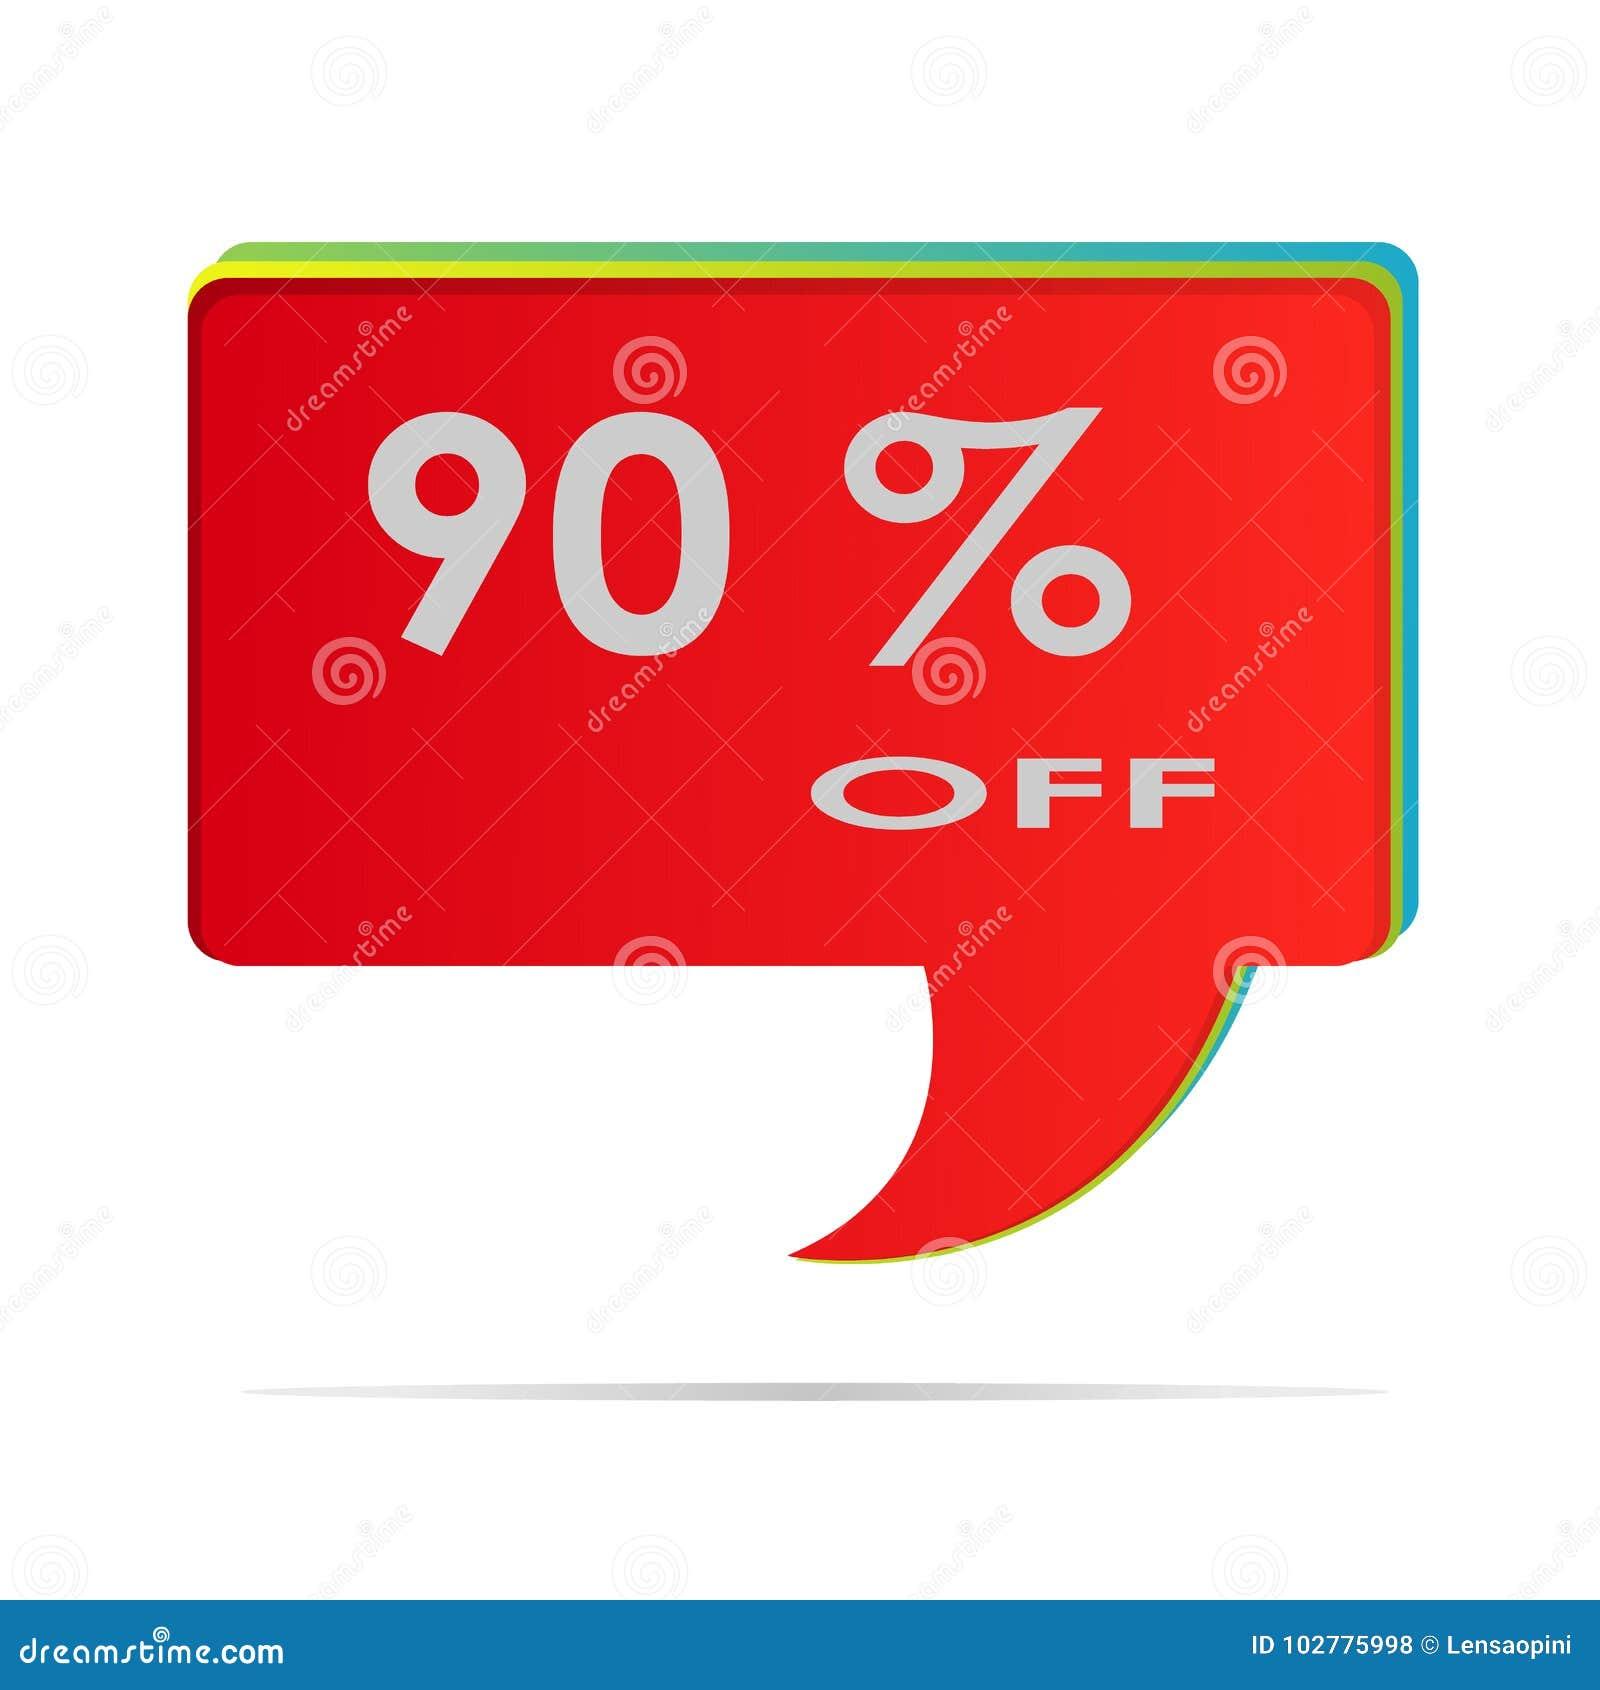 Word Box Art Wiring Diagrams Flash Exposure Meter Circuit Diagram Tradeoficcom 90 Off Sale Discount Banner Special Offer Pop Design Rh Dreamstime Com World